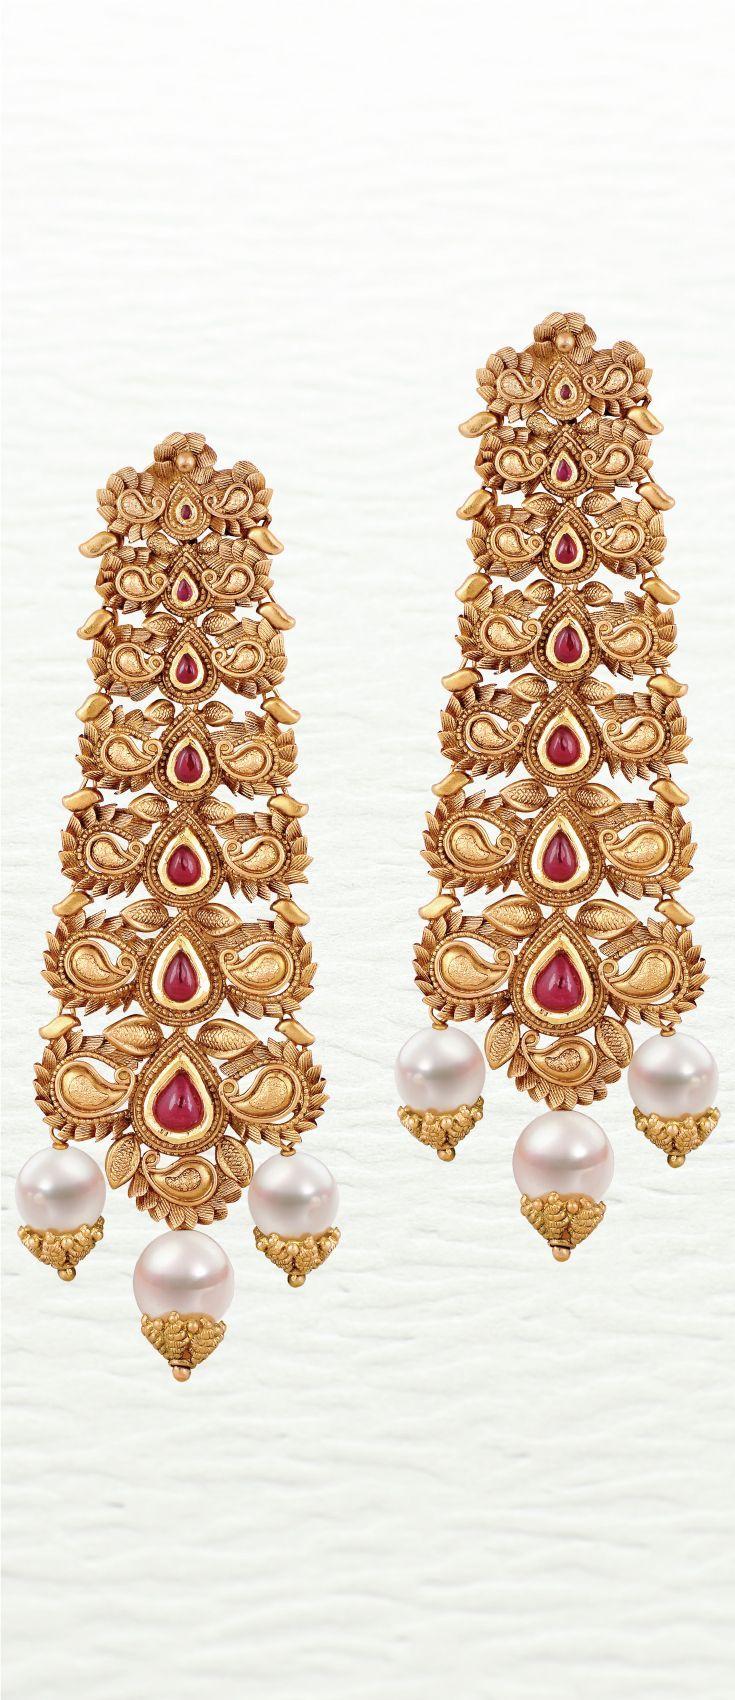 Azva modern handcrafted gold earrings goldjewellery luxury style